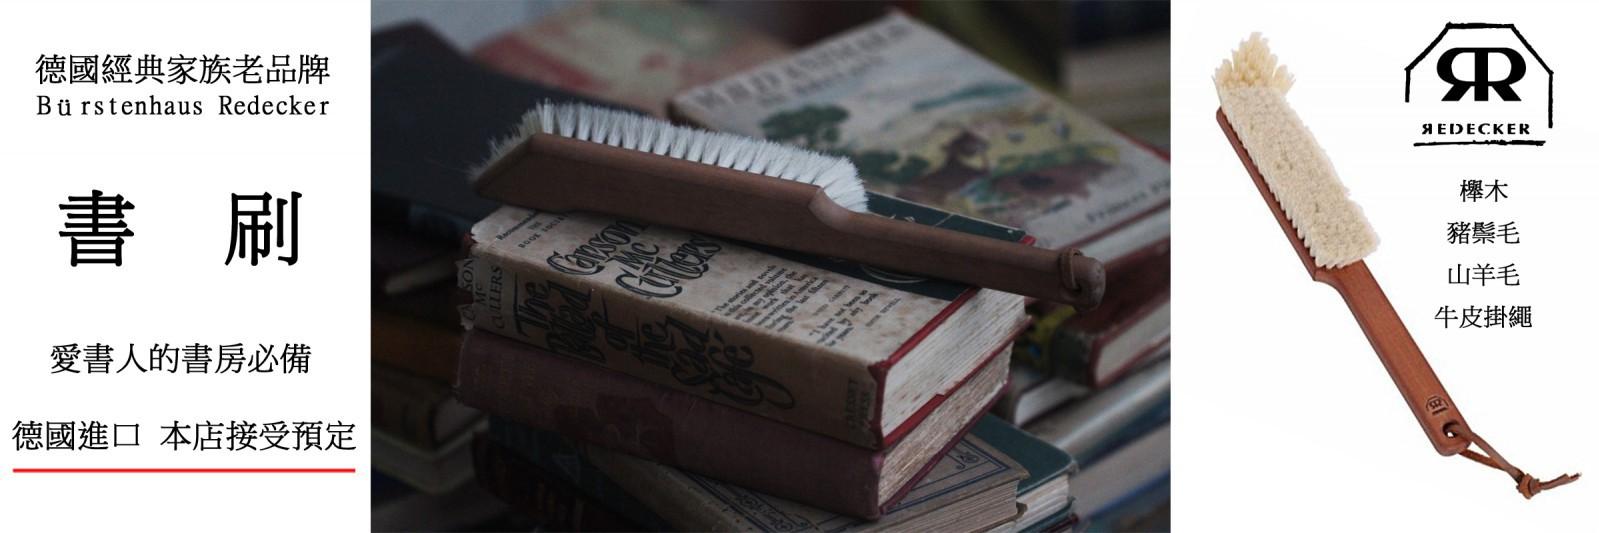 http://book.kongfz.com/207838/920110887/